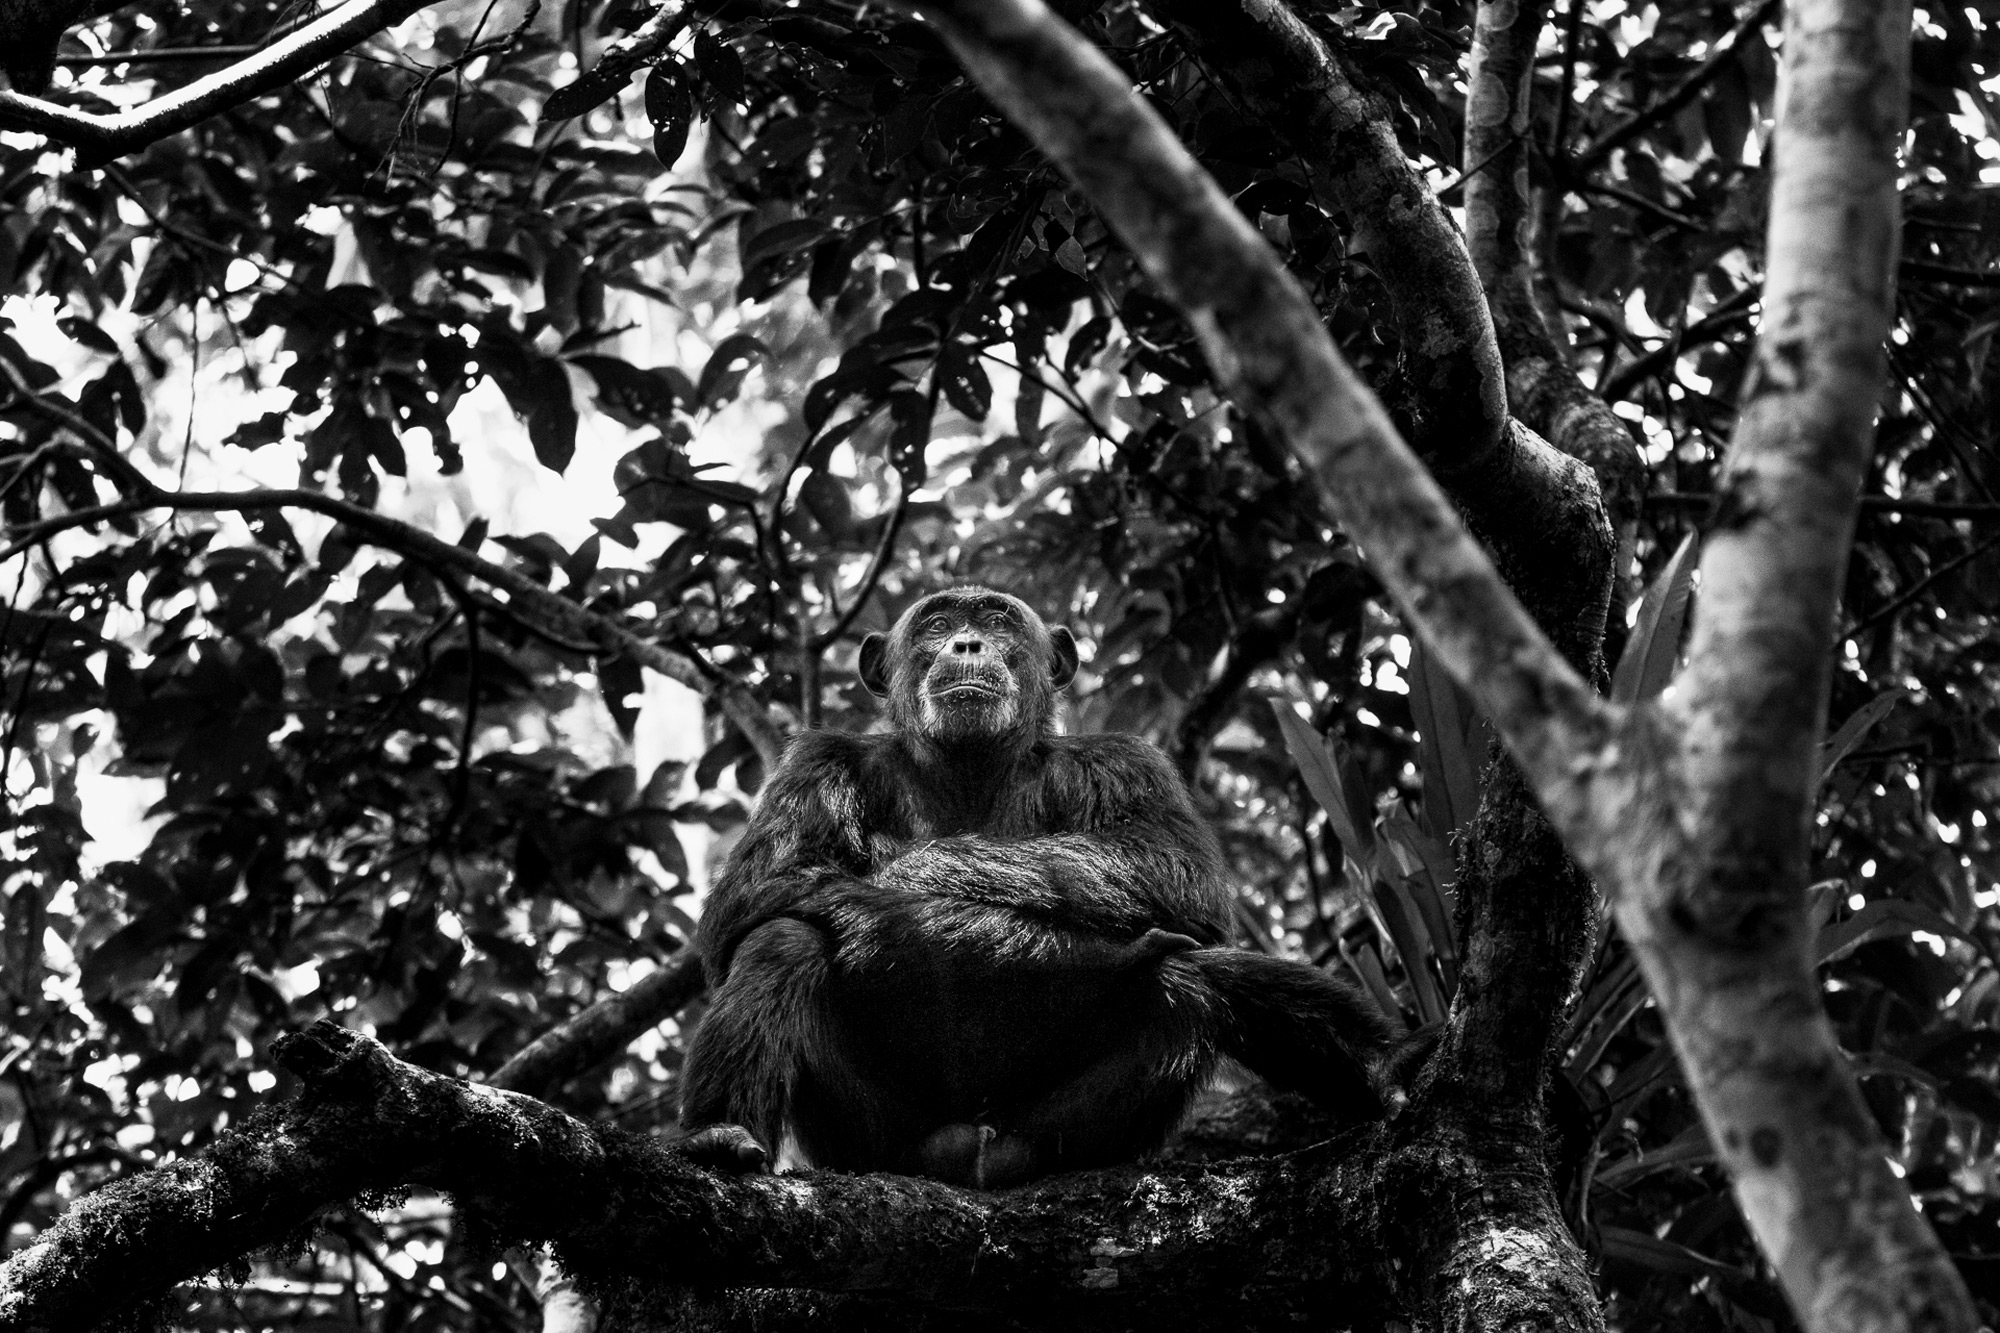 Quiet contemplation in Kibale National Park, Uganda © Patrice Quillard